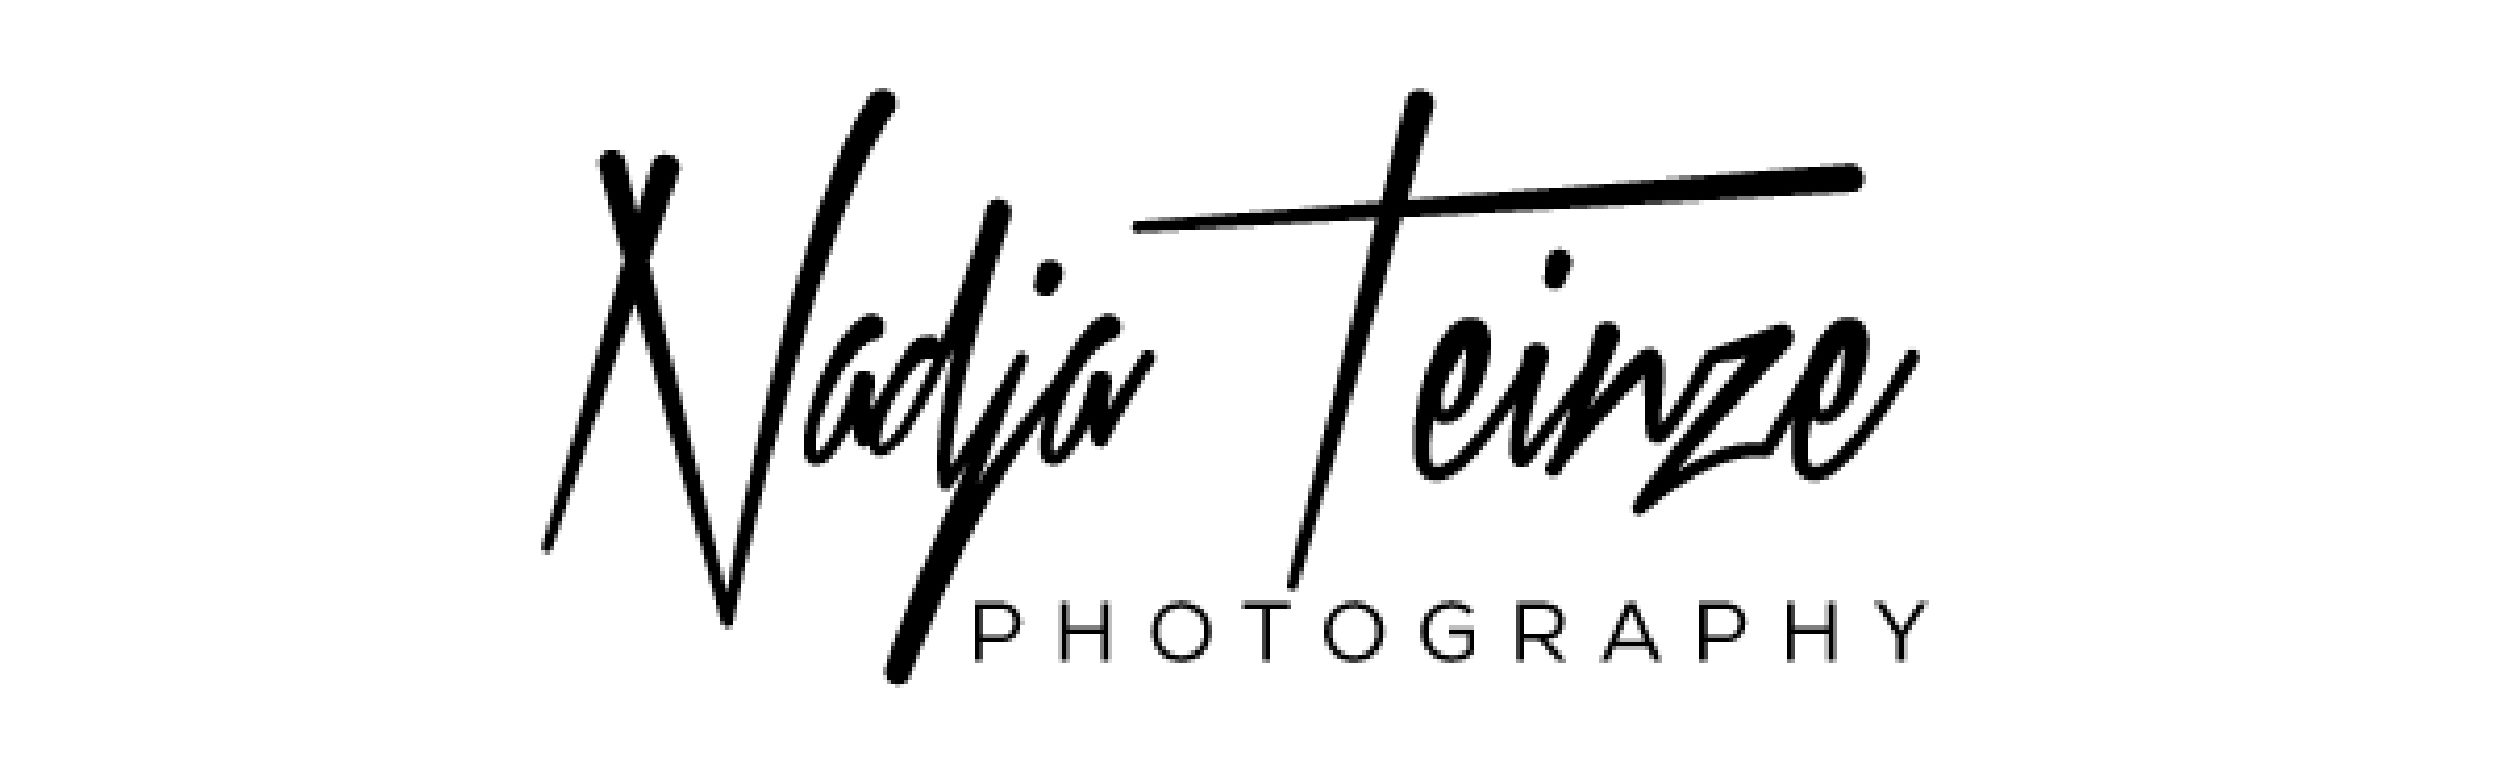 Teinze Photography